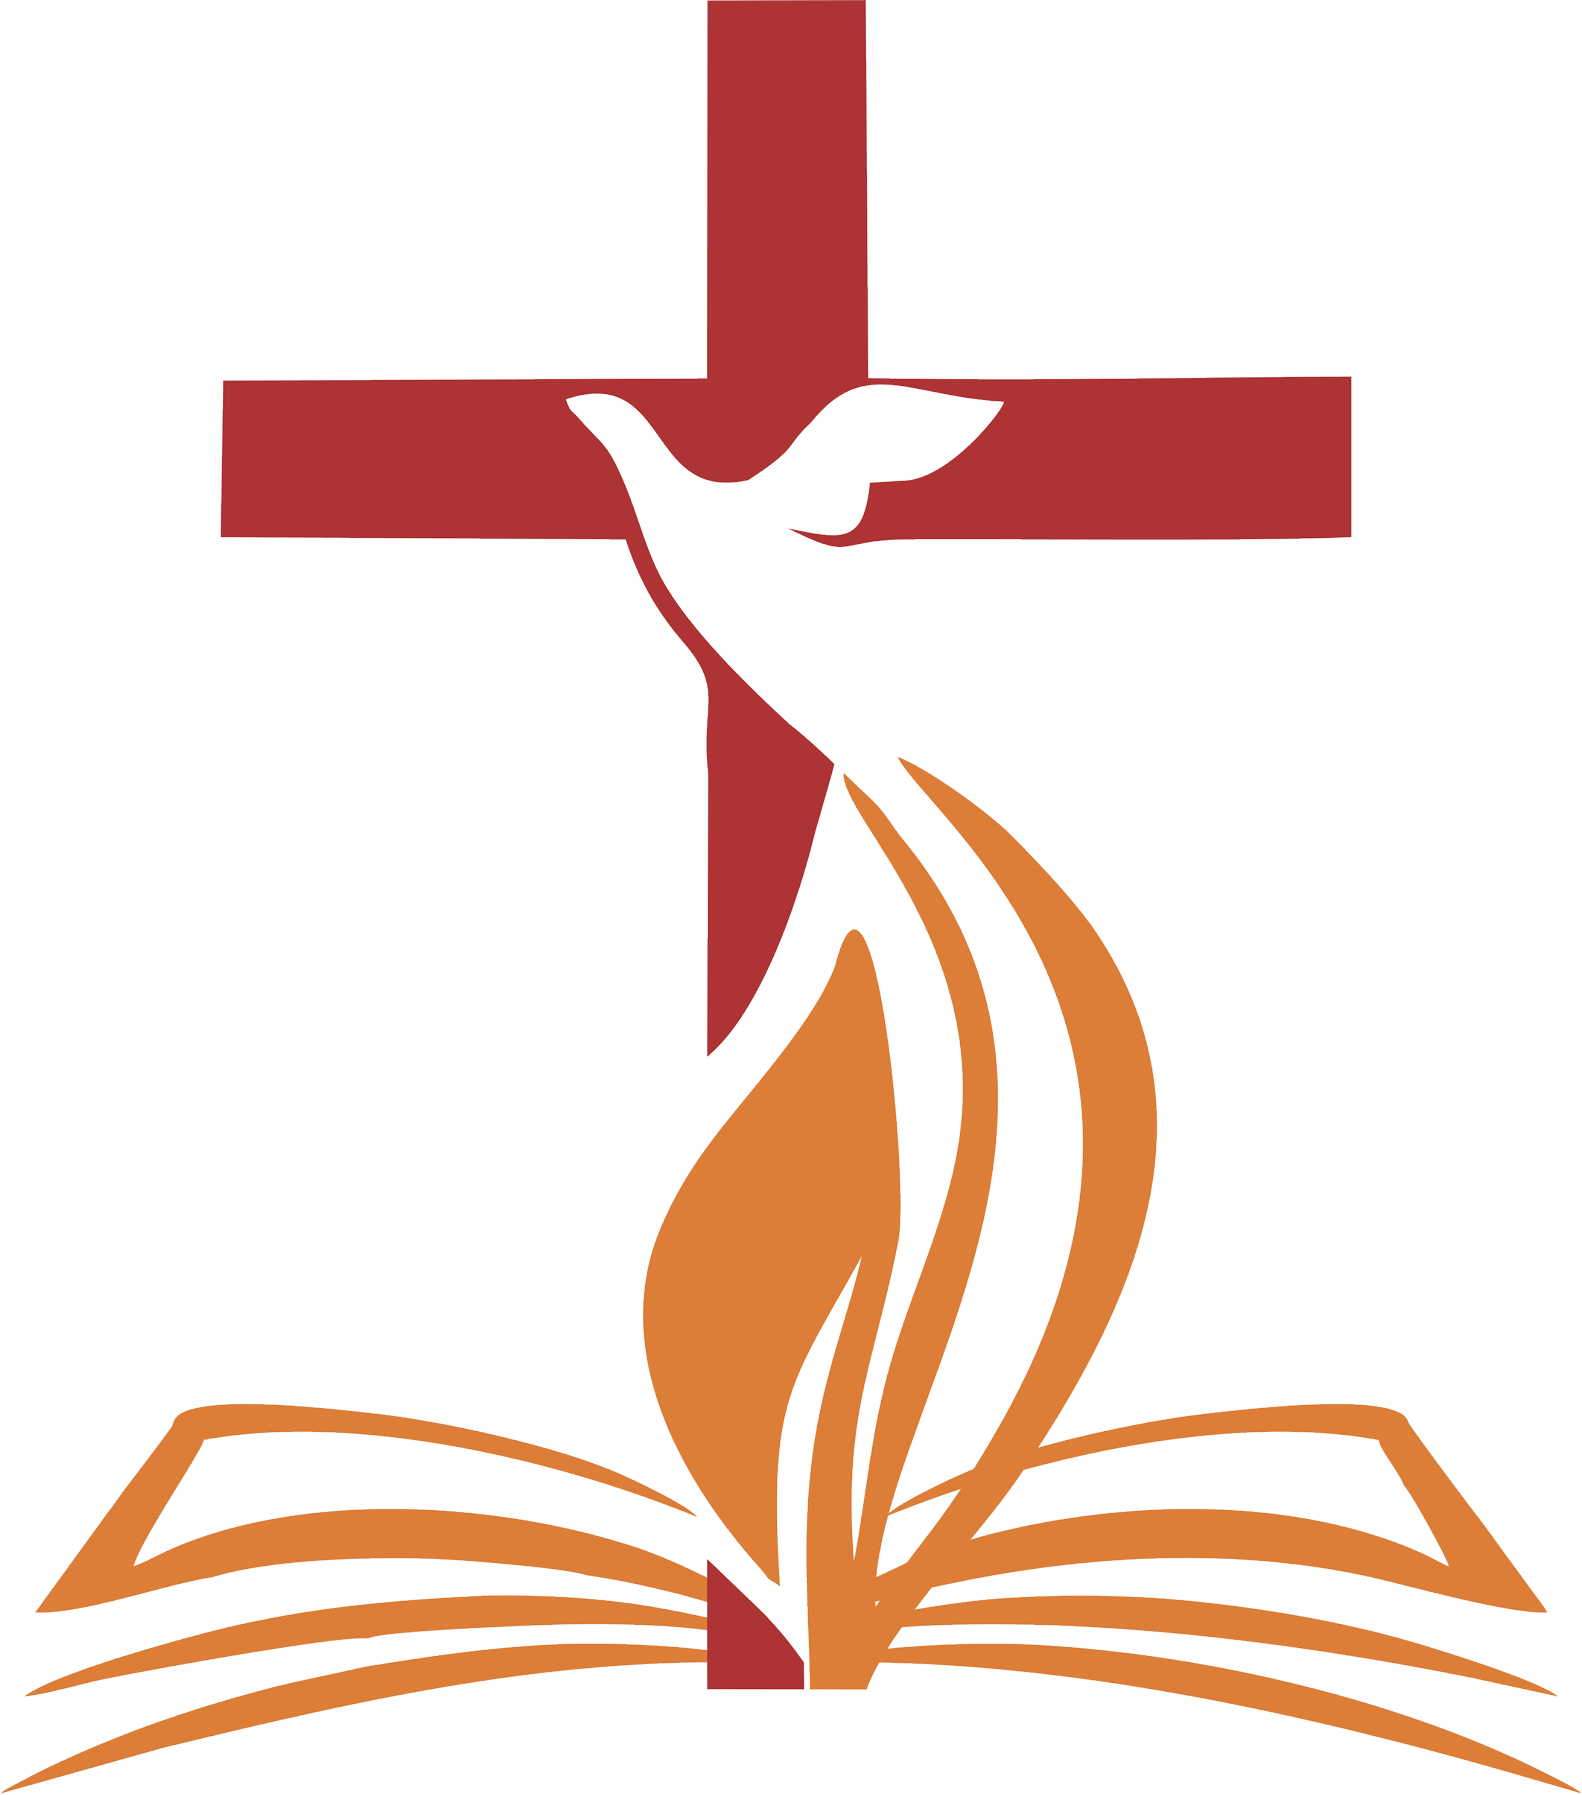 Mission Clipart Evangelism.